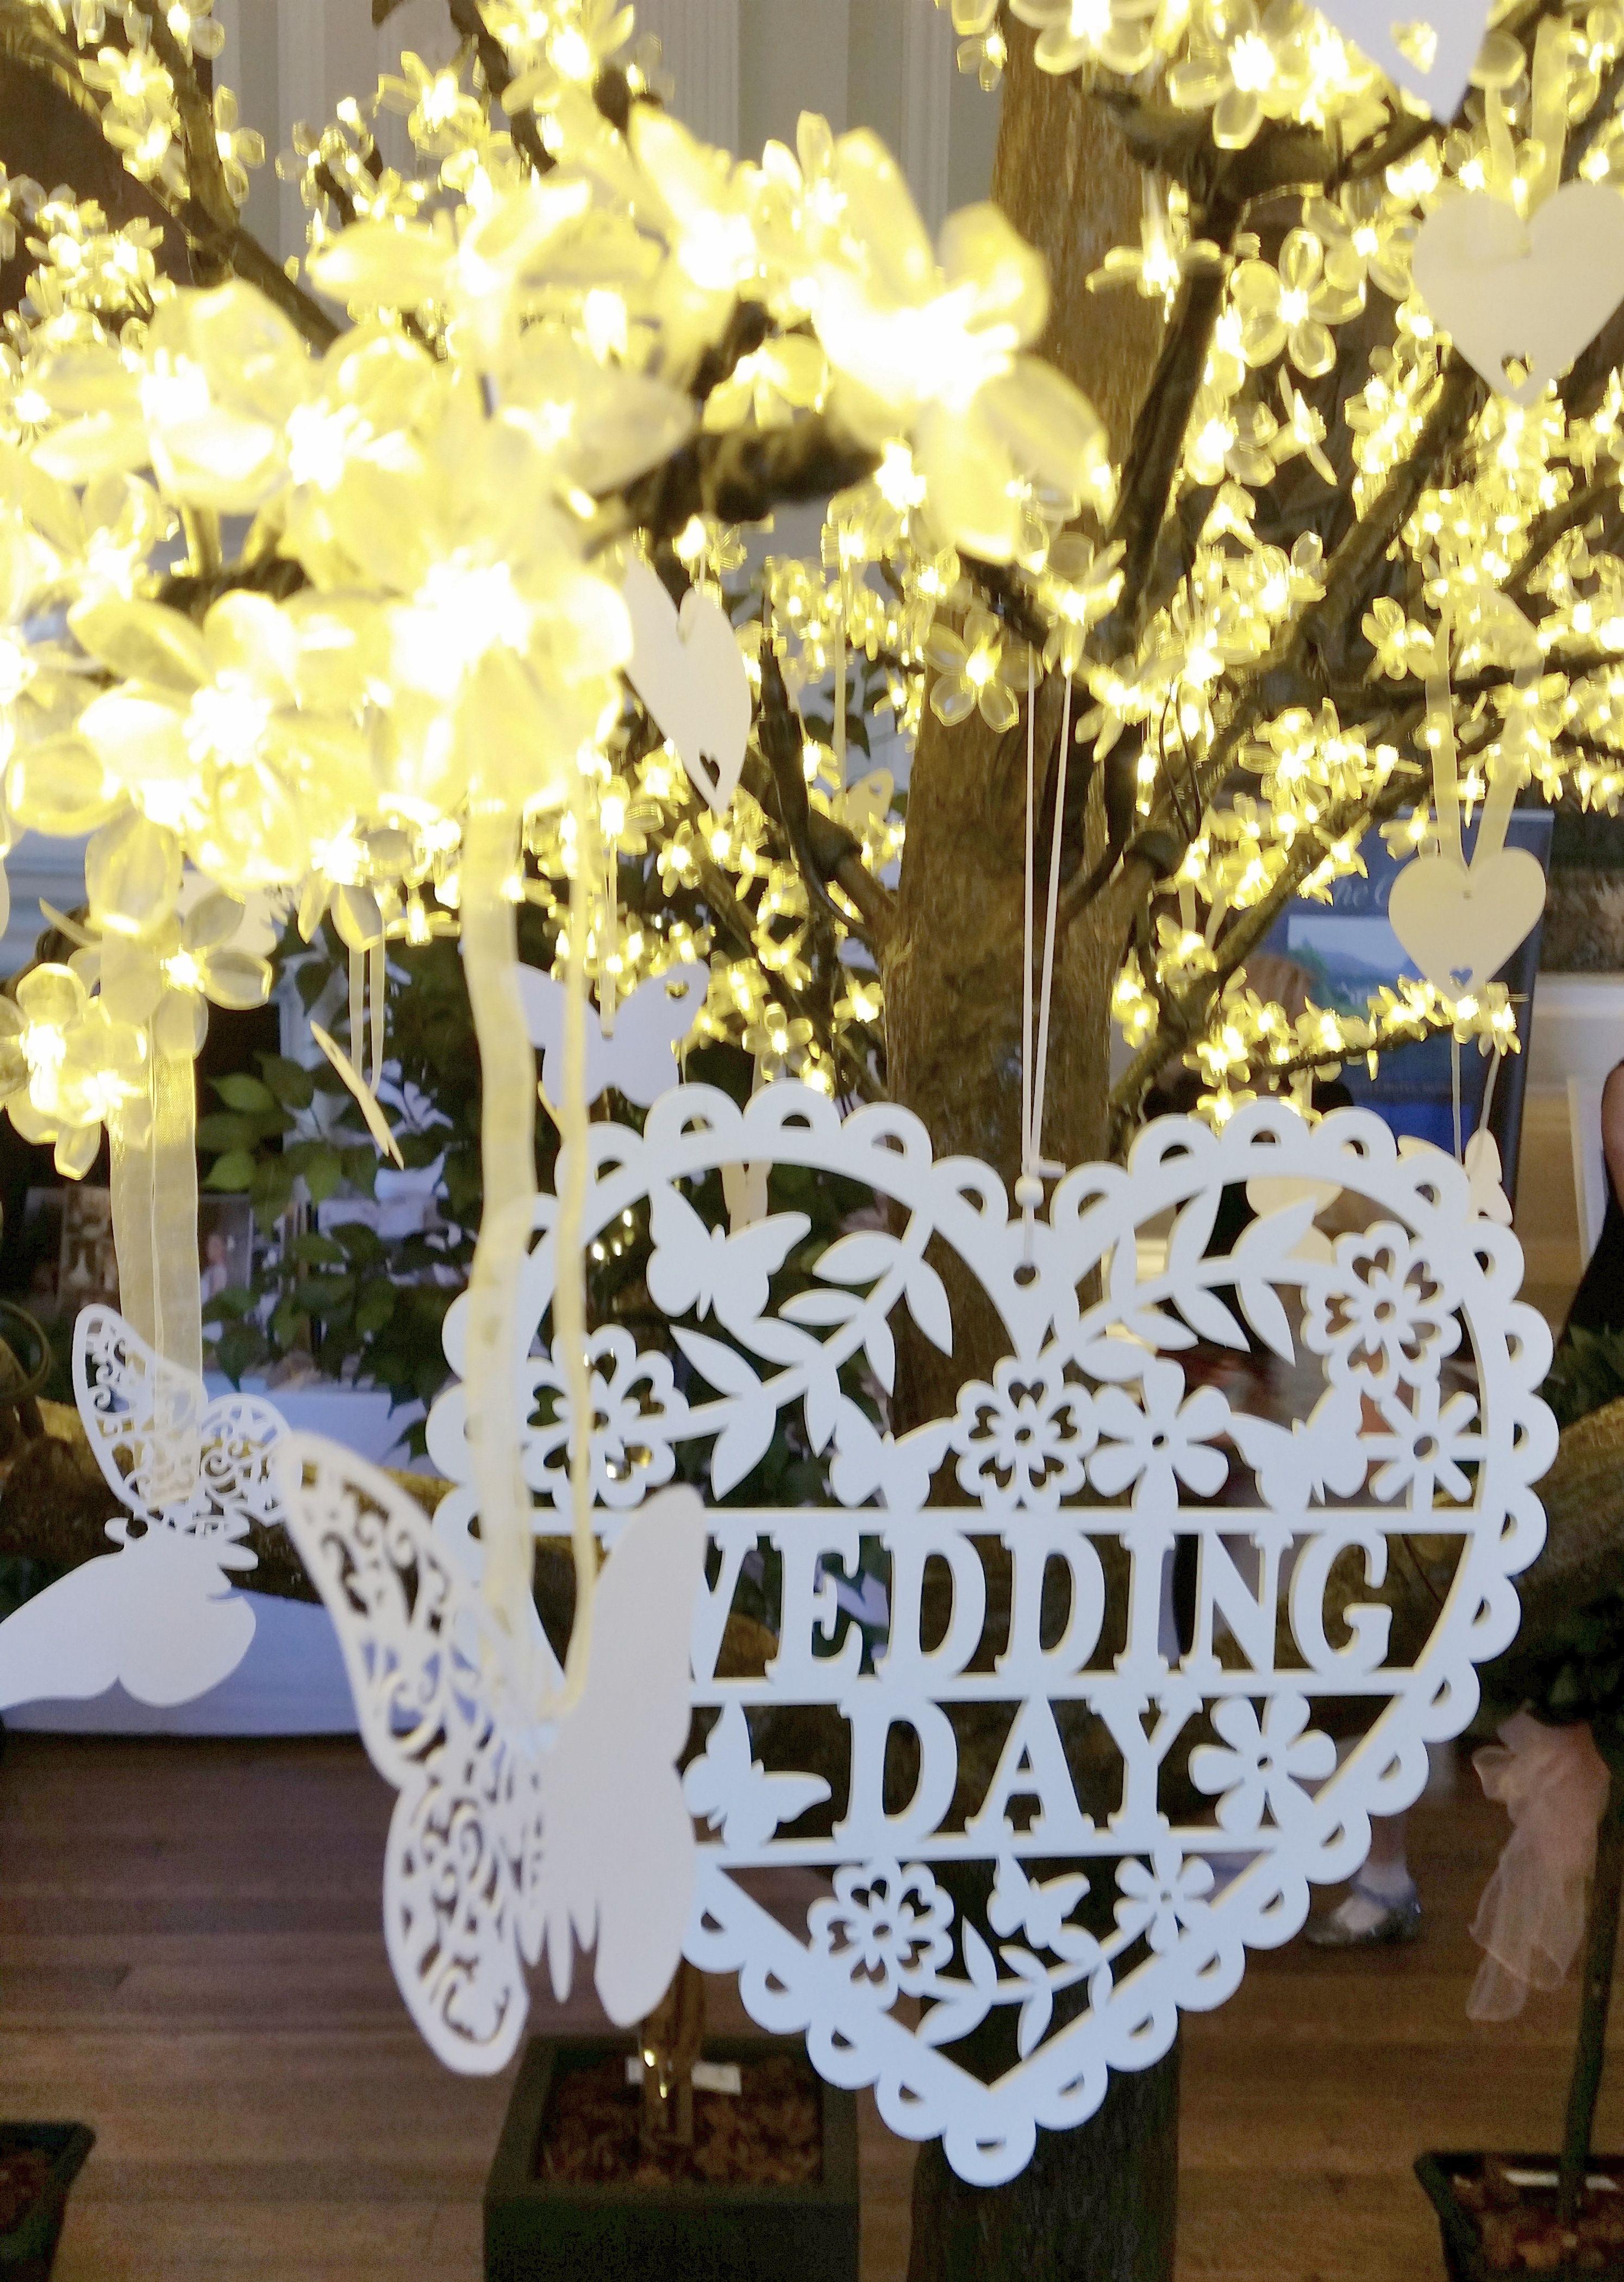 Beautiful Wedding Wishes Tree From Www Limelightweddings Co Uk